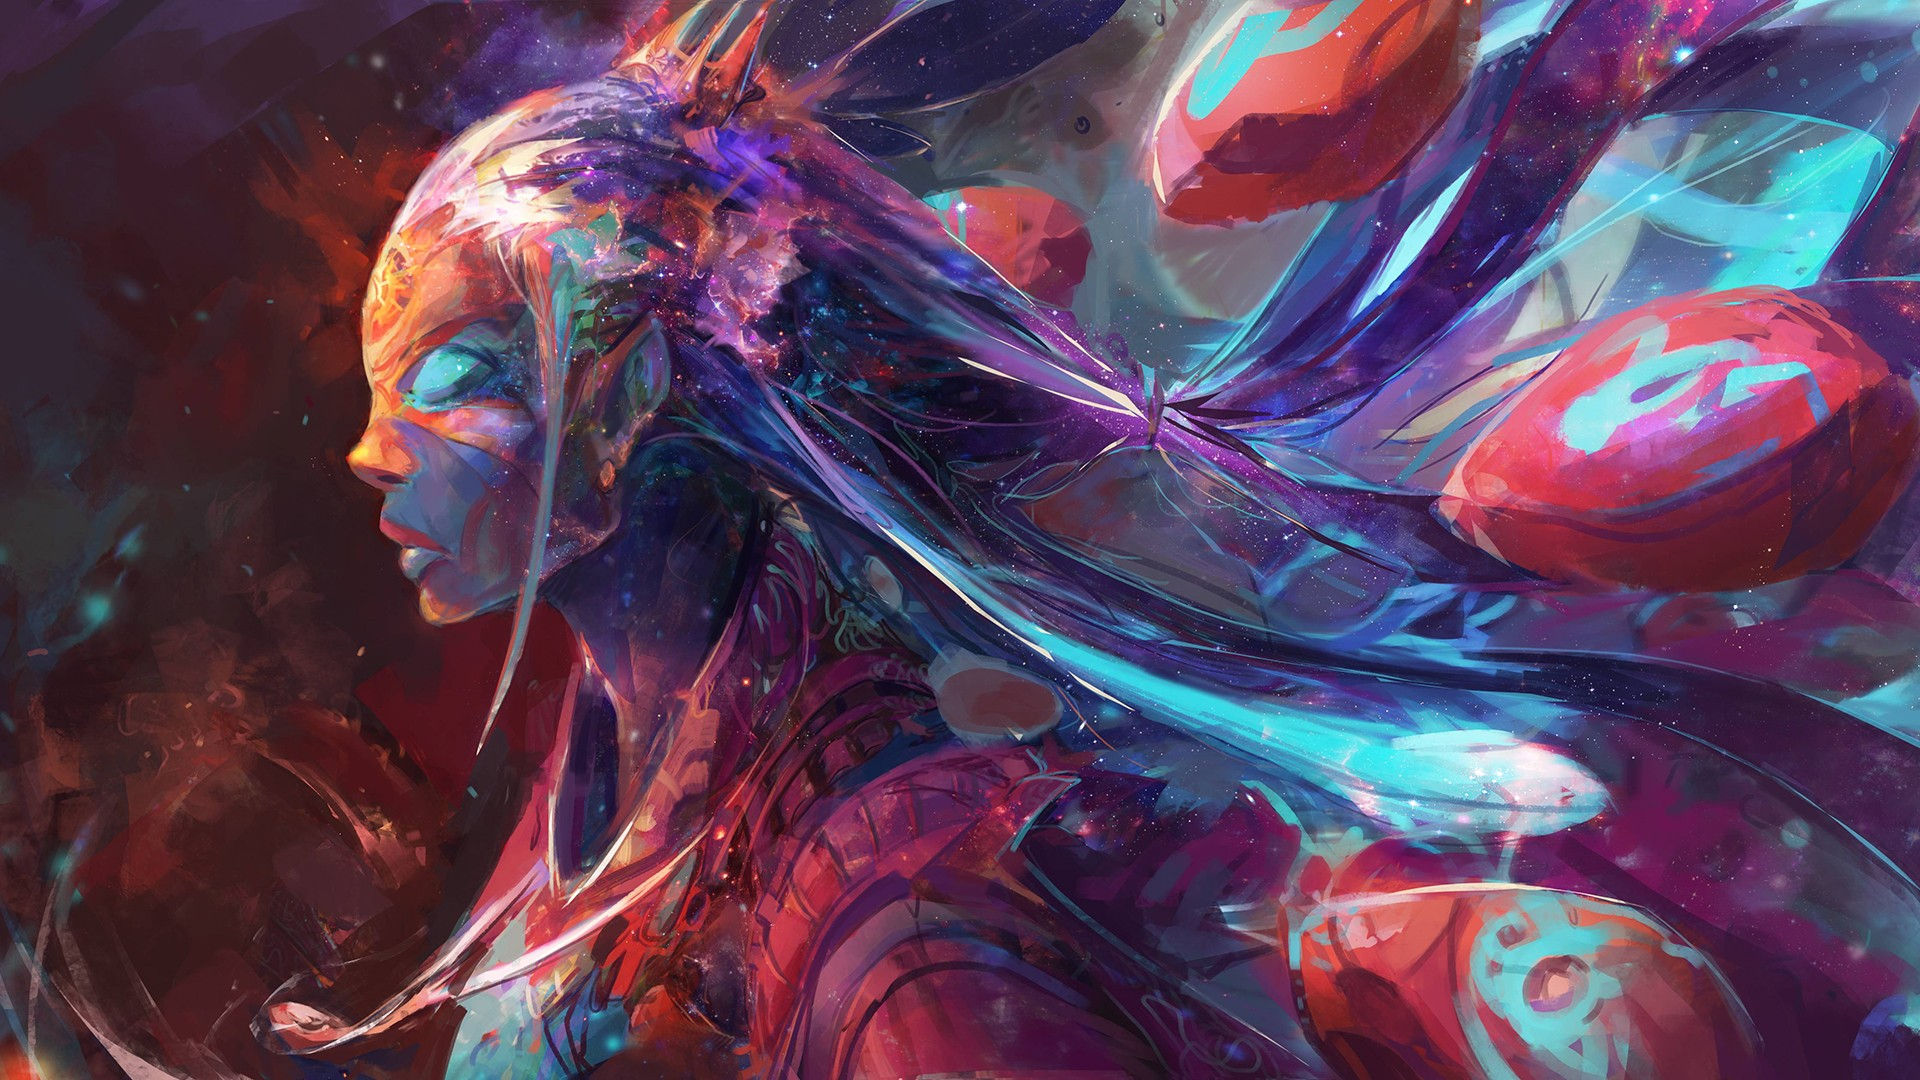 Fondos de pantalla Chica de colores Arte digital